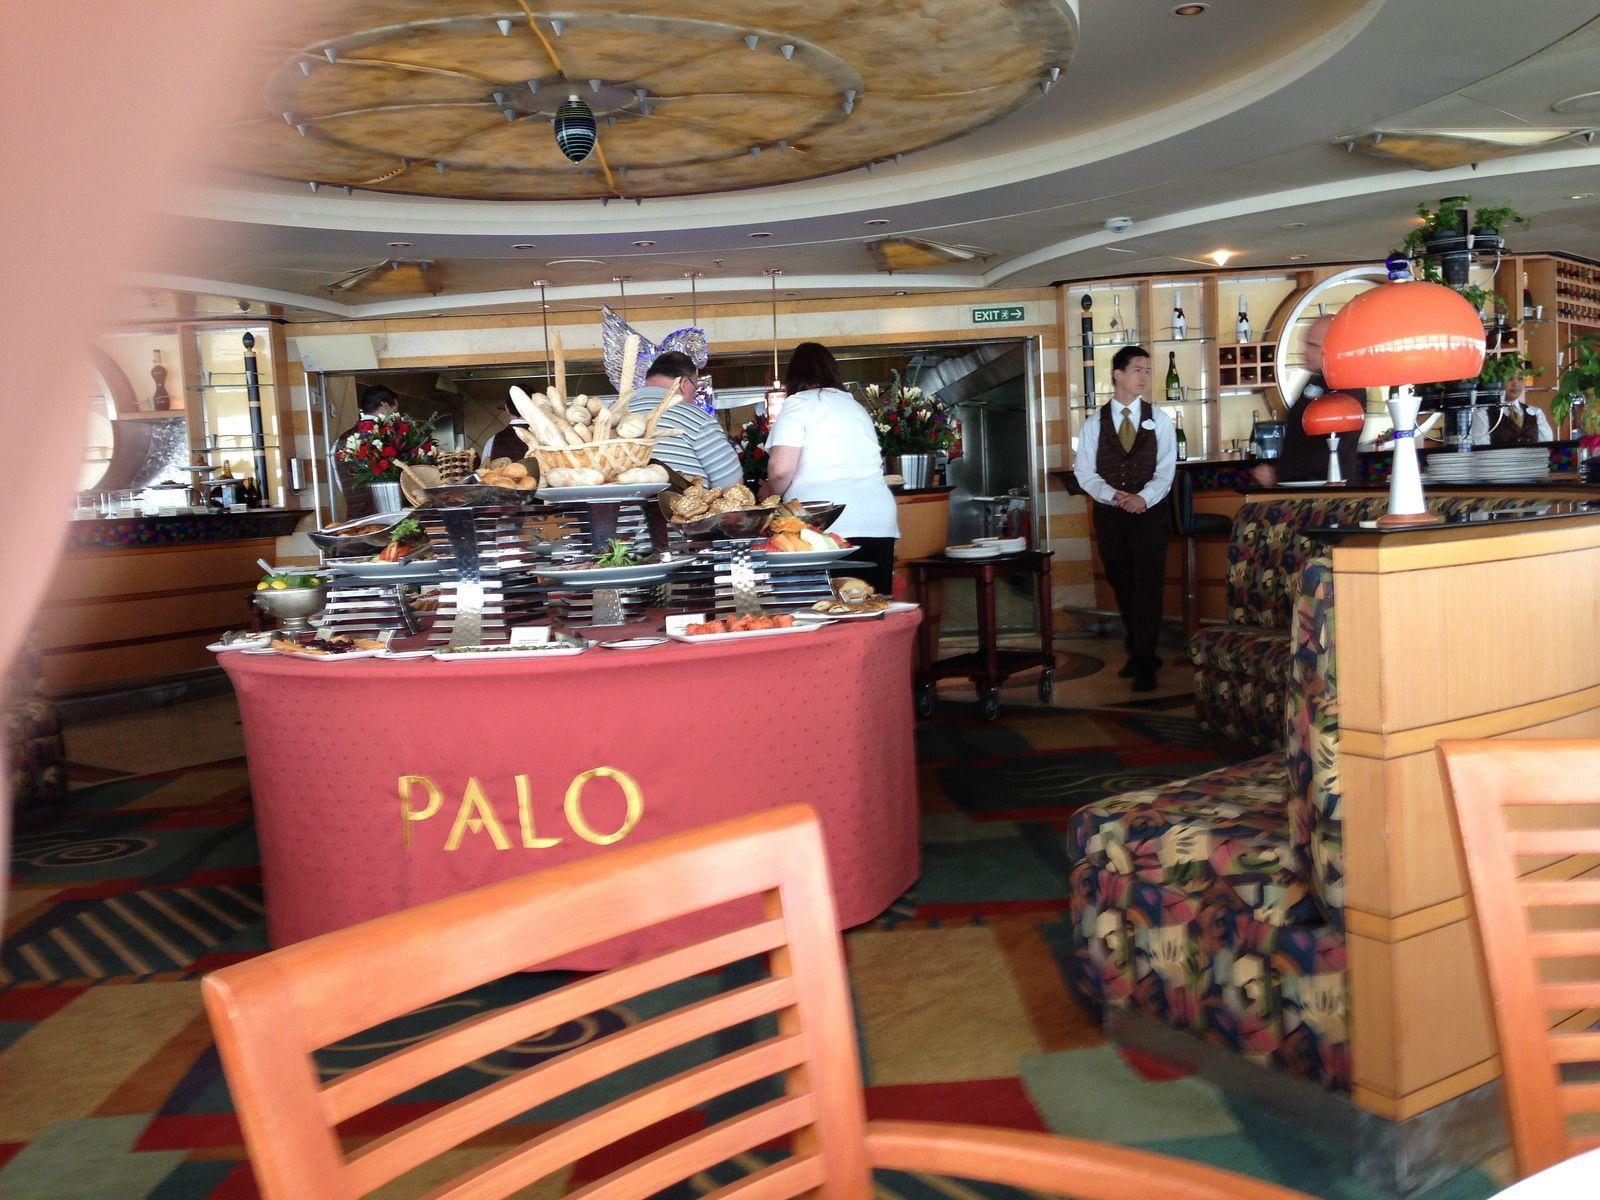 Palo's :)